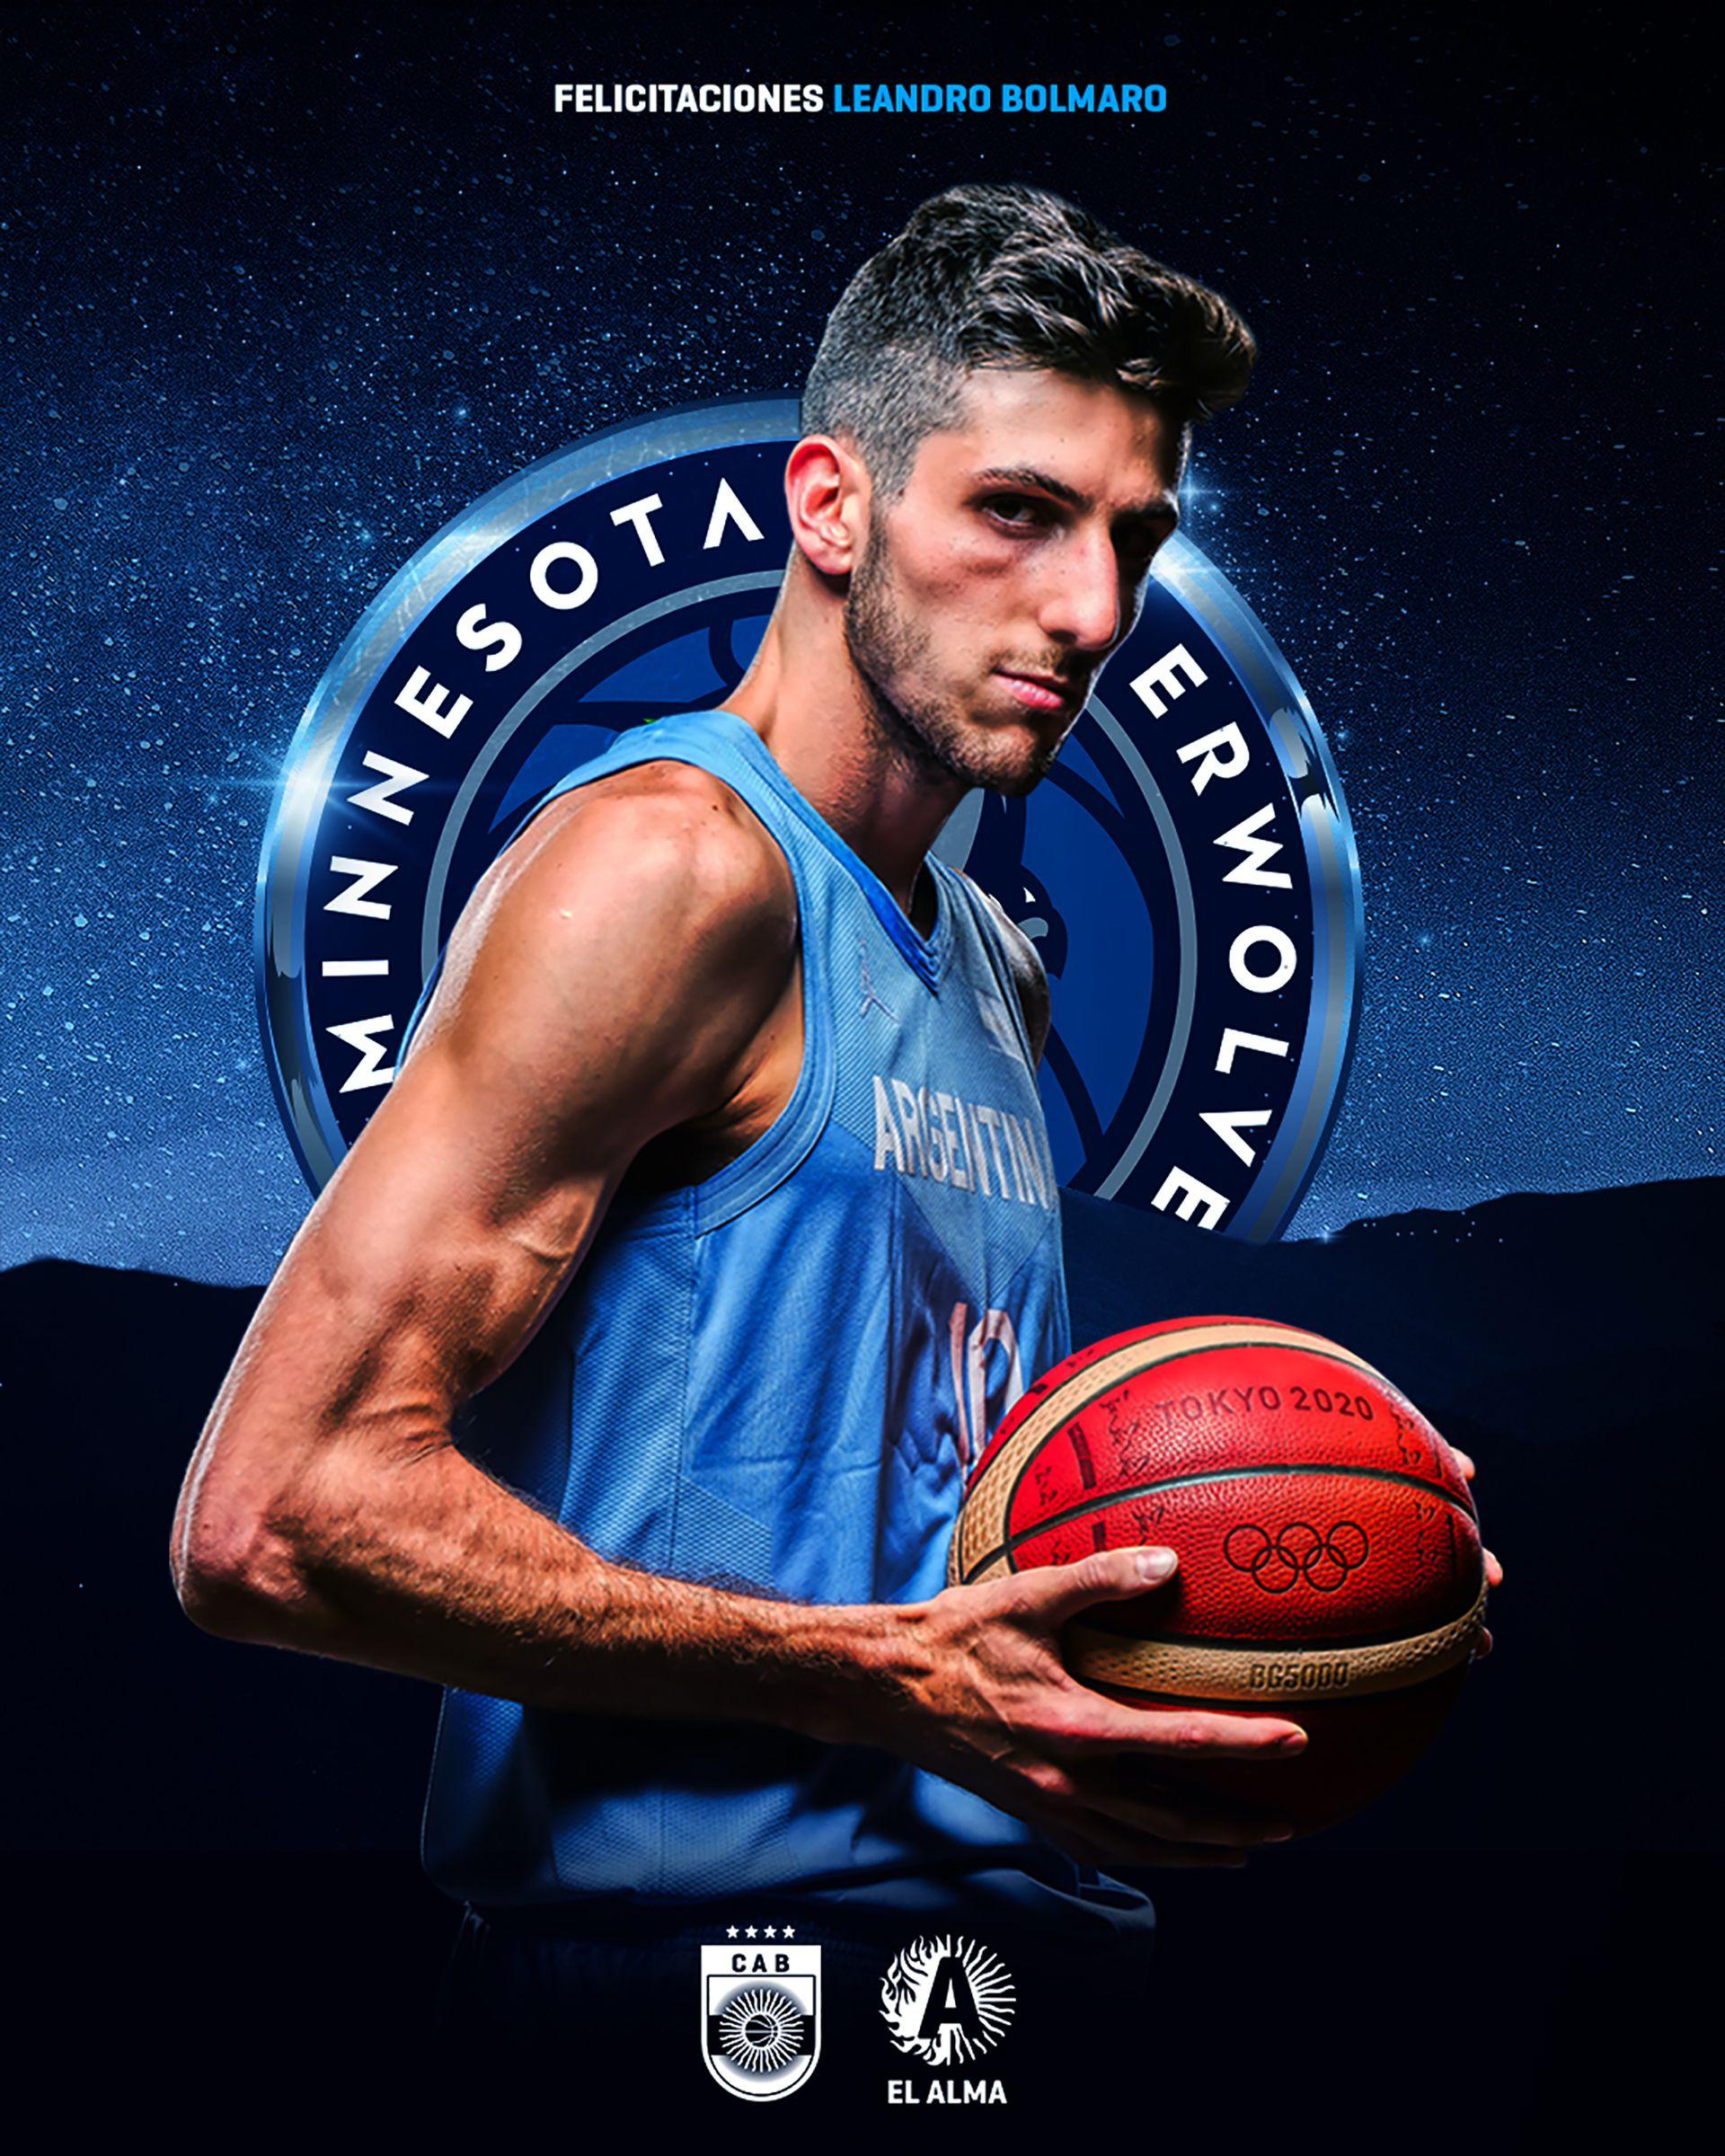 Leandro Bolmaron presentado en Timberwolves